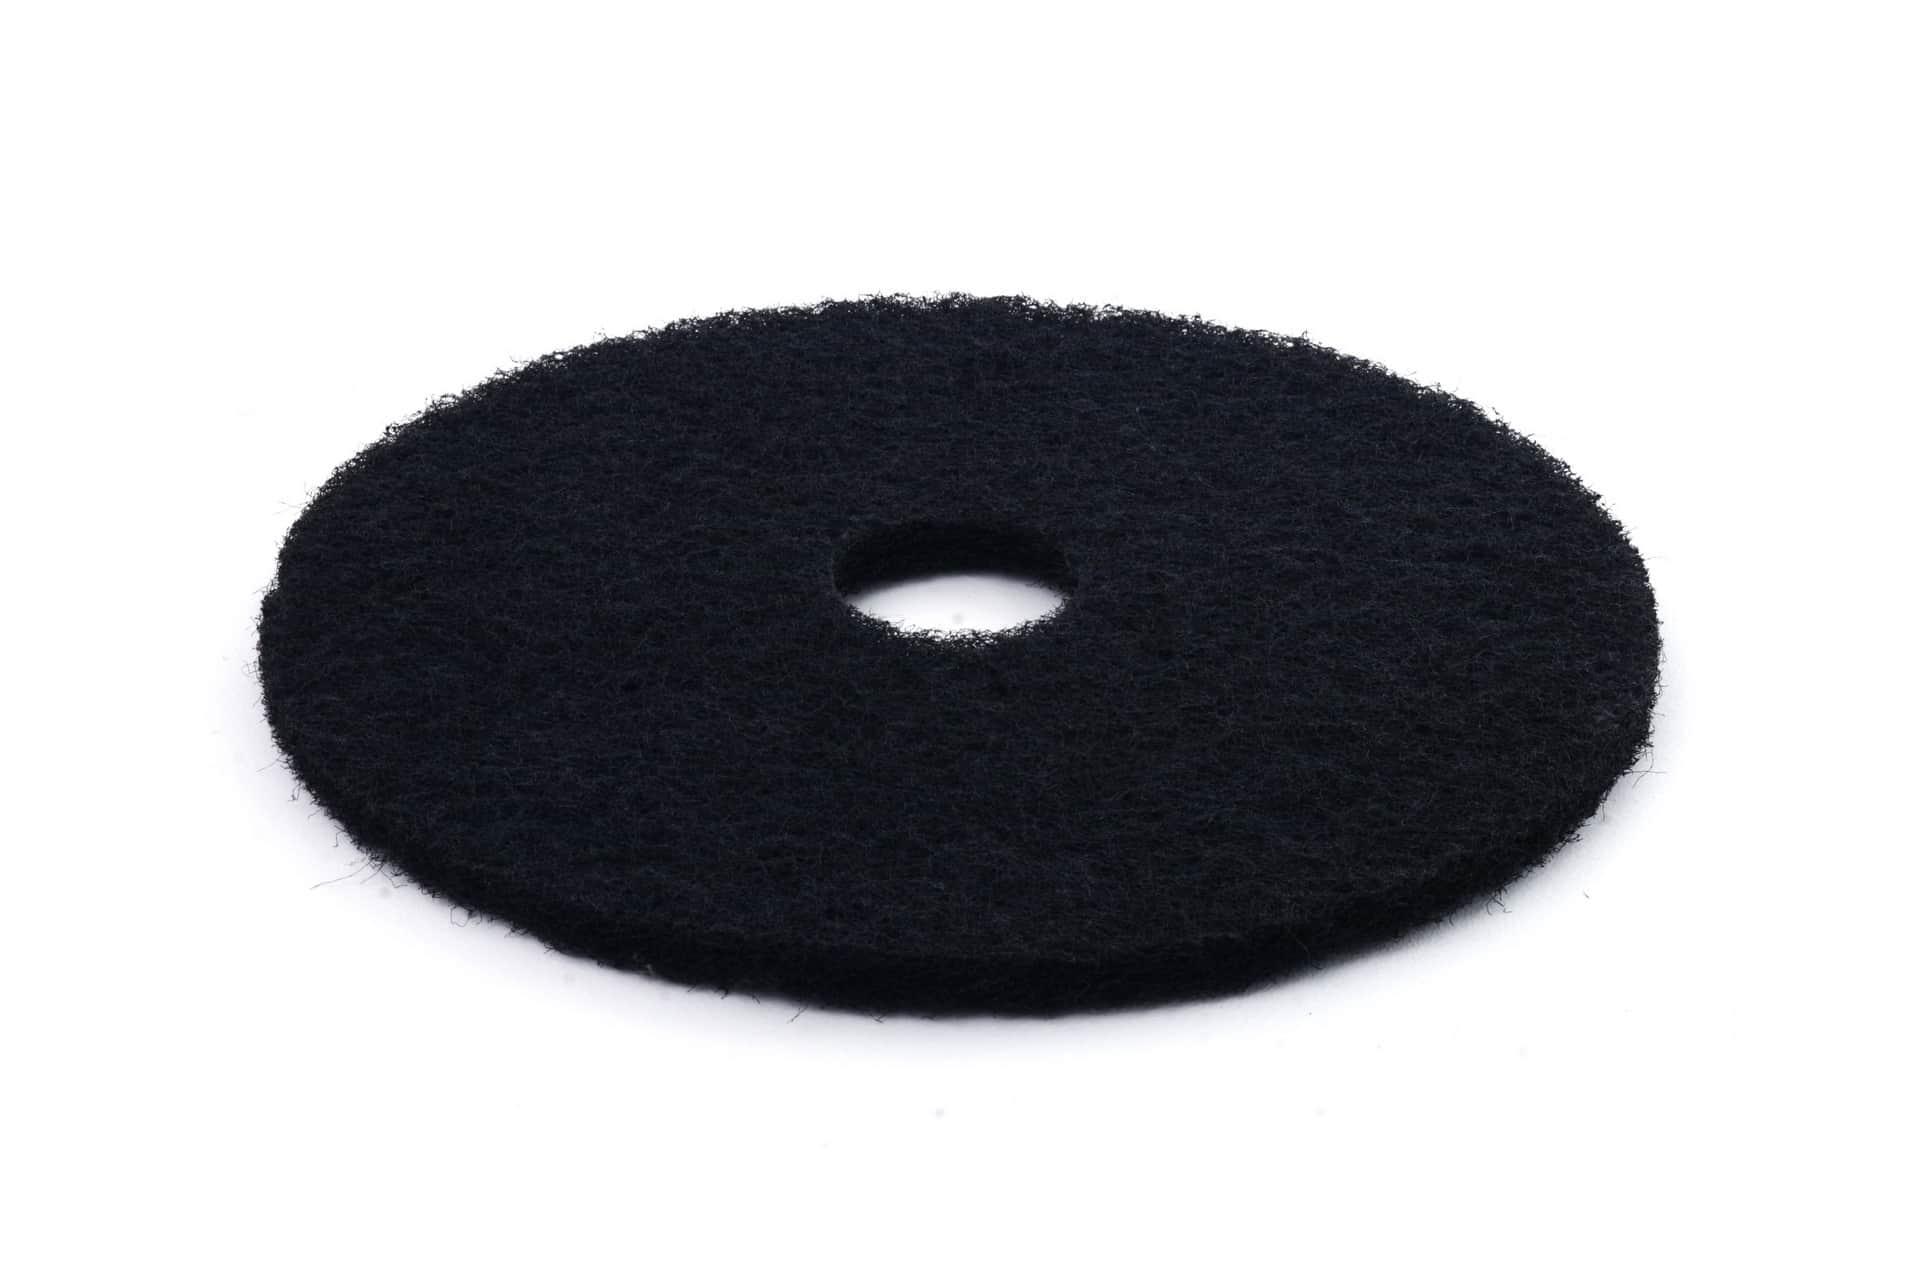 3M_black_stripper_pad_7200_แผ่นขัดล้างพื้นสีดำ_01